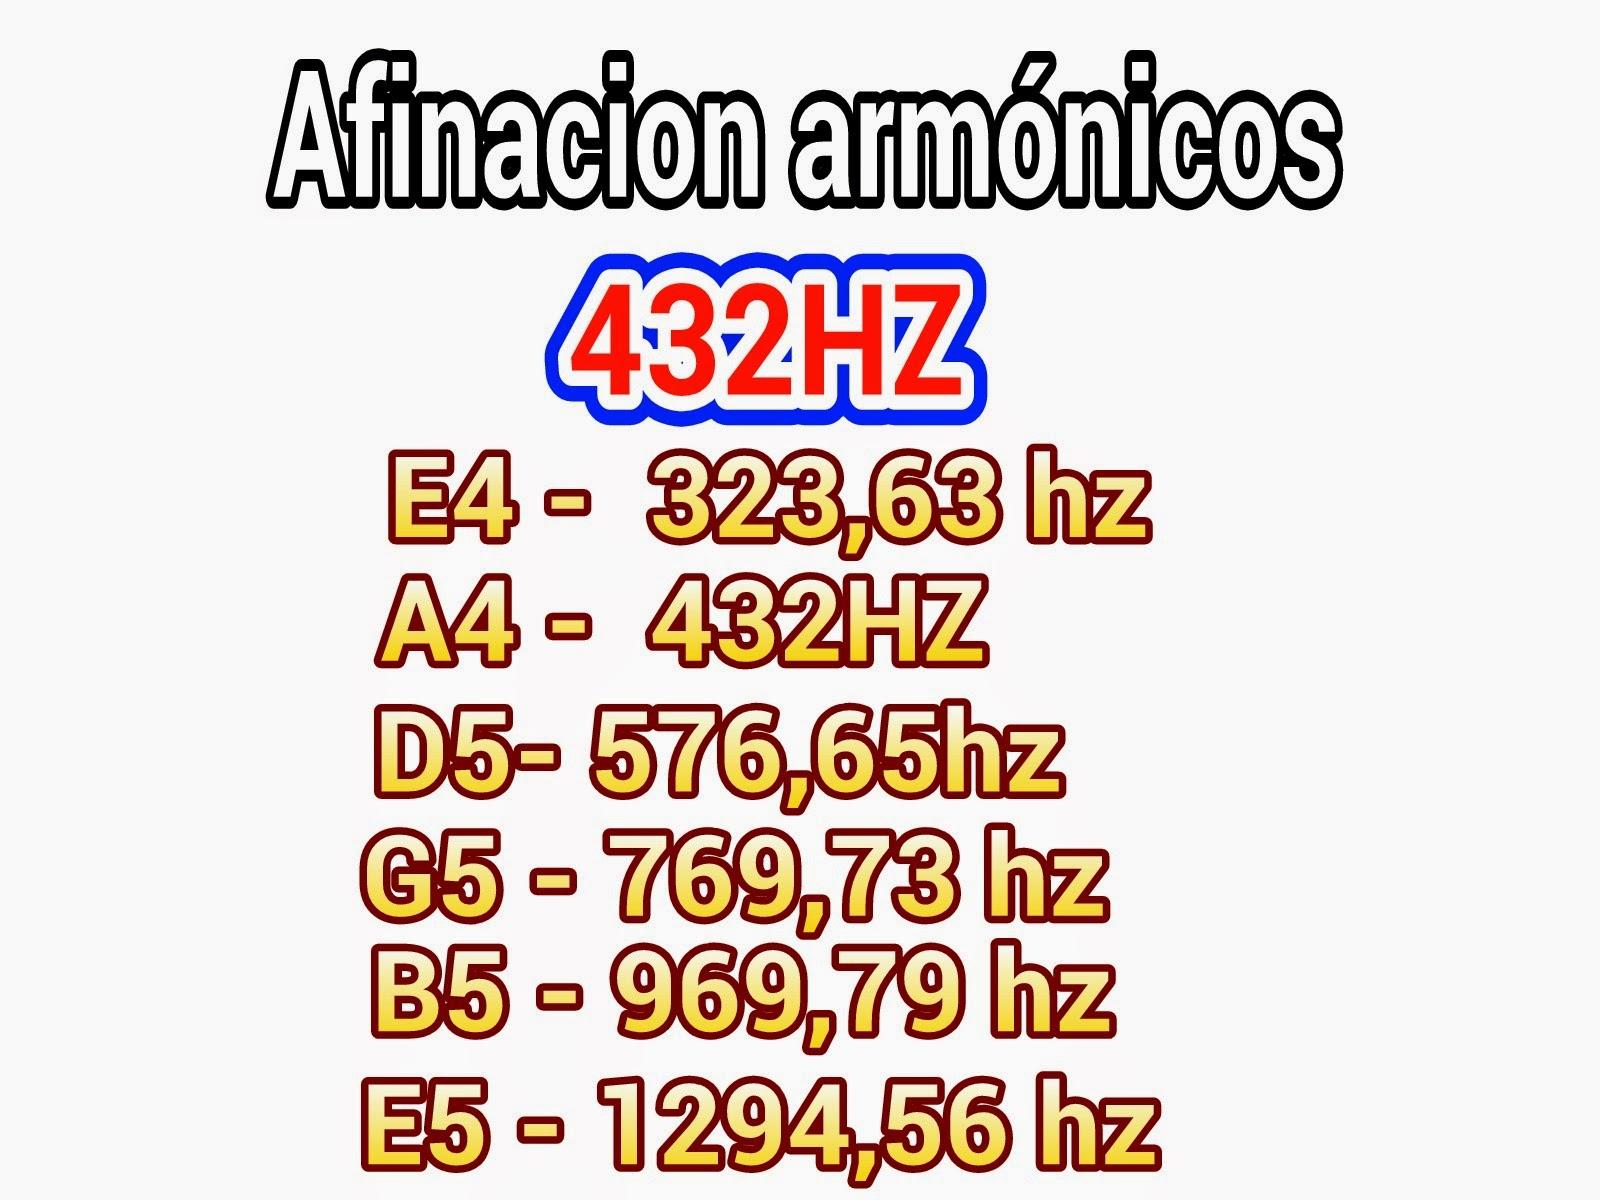 tornadojack 432 hz afinacion armonicos continua tuning guitar 432 hz. Black Bedroom Furniture Sets. Home Design Ideas